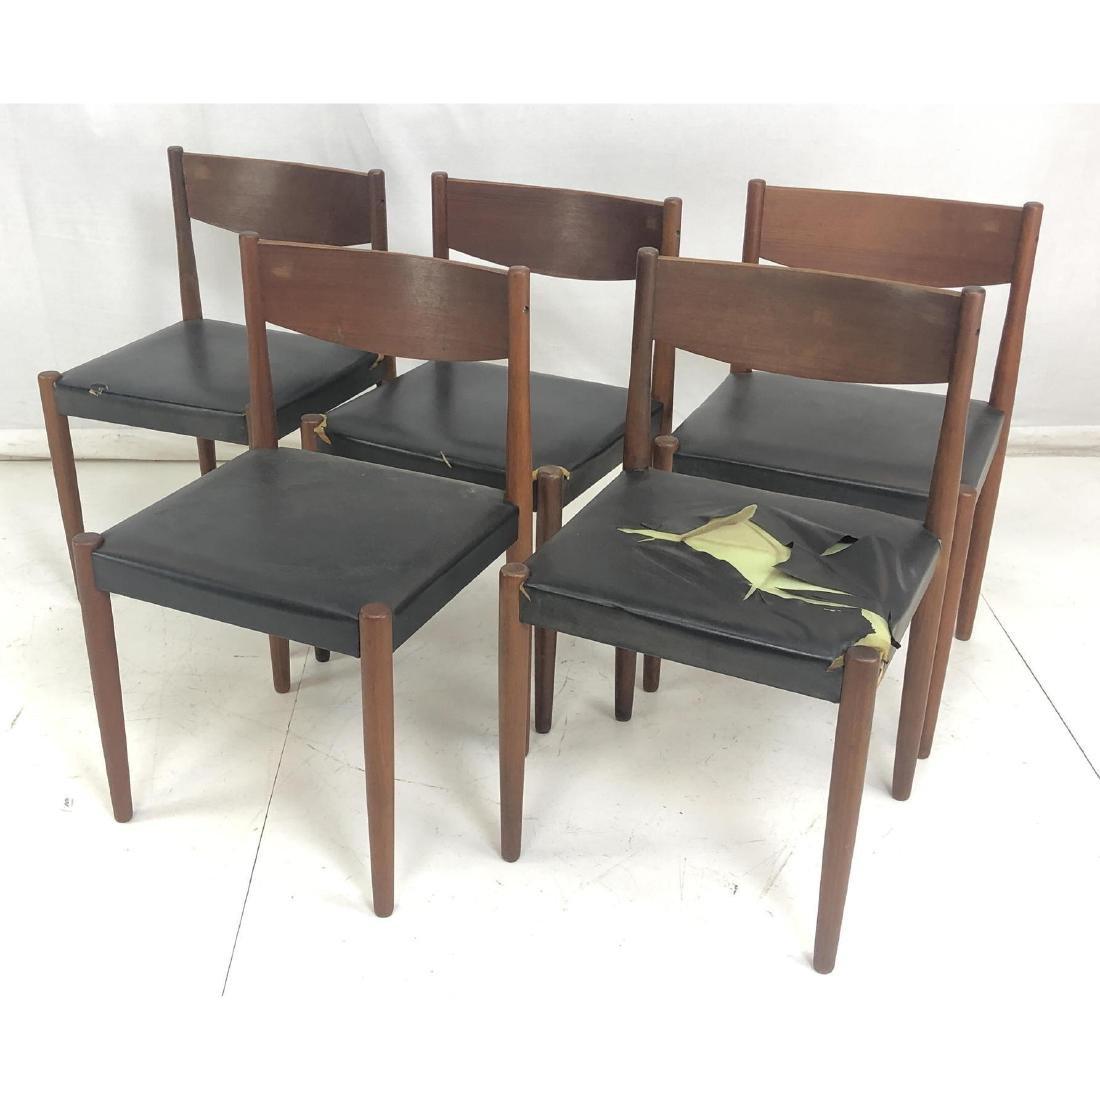 Set 5 Modernist Teak FREM ROJLE Dining Chairs. Da